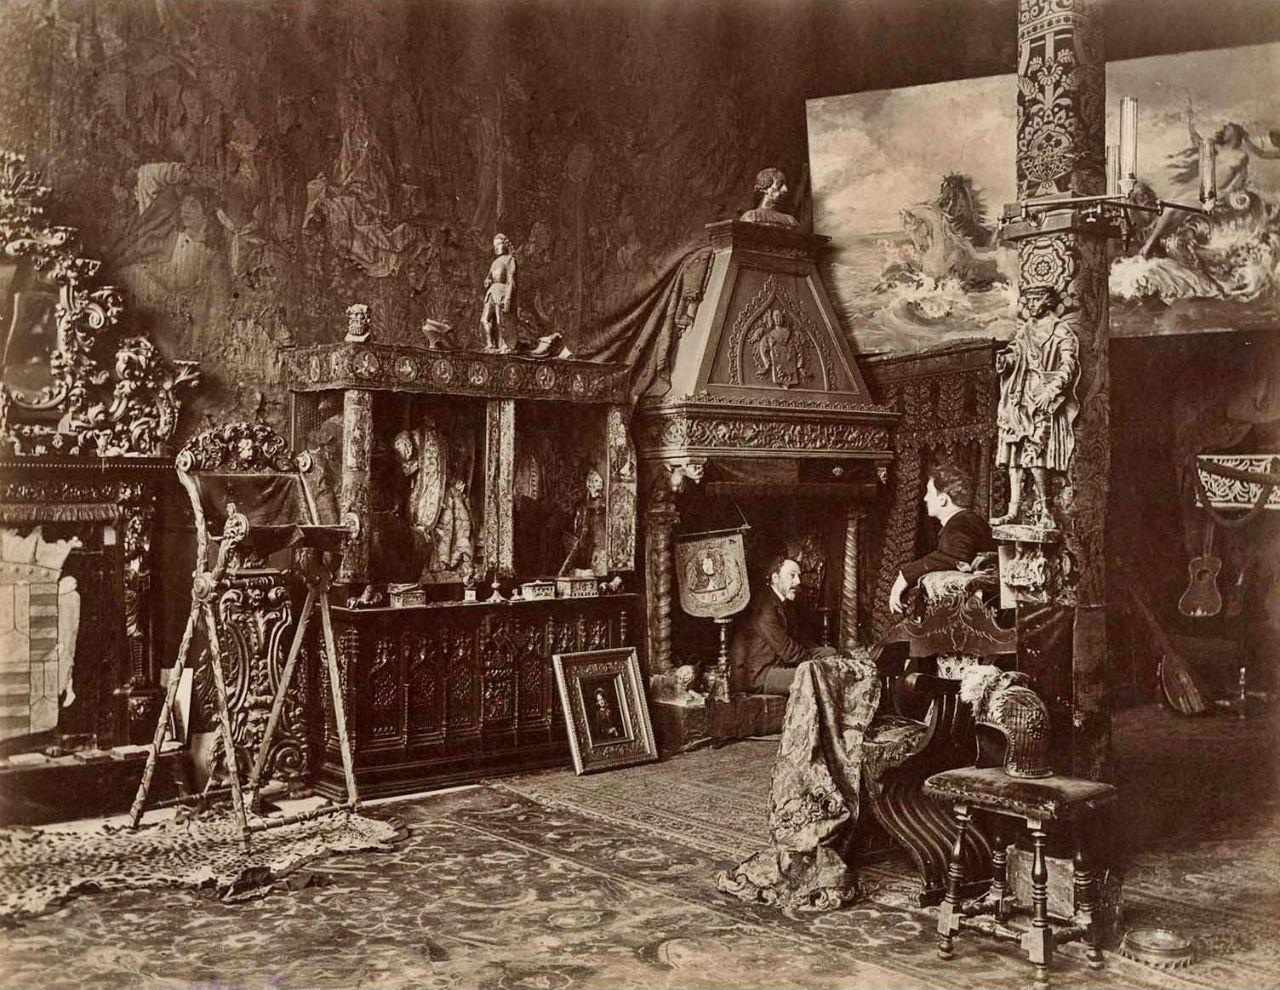 Cesare Augusto Detti 1880-1900 Piasa foto Edmond Bénard.jpg